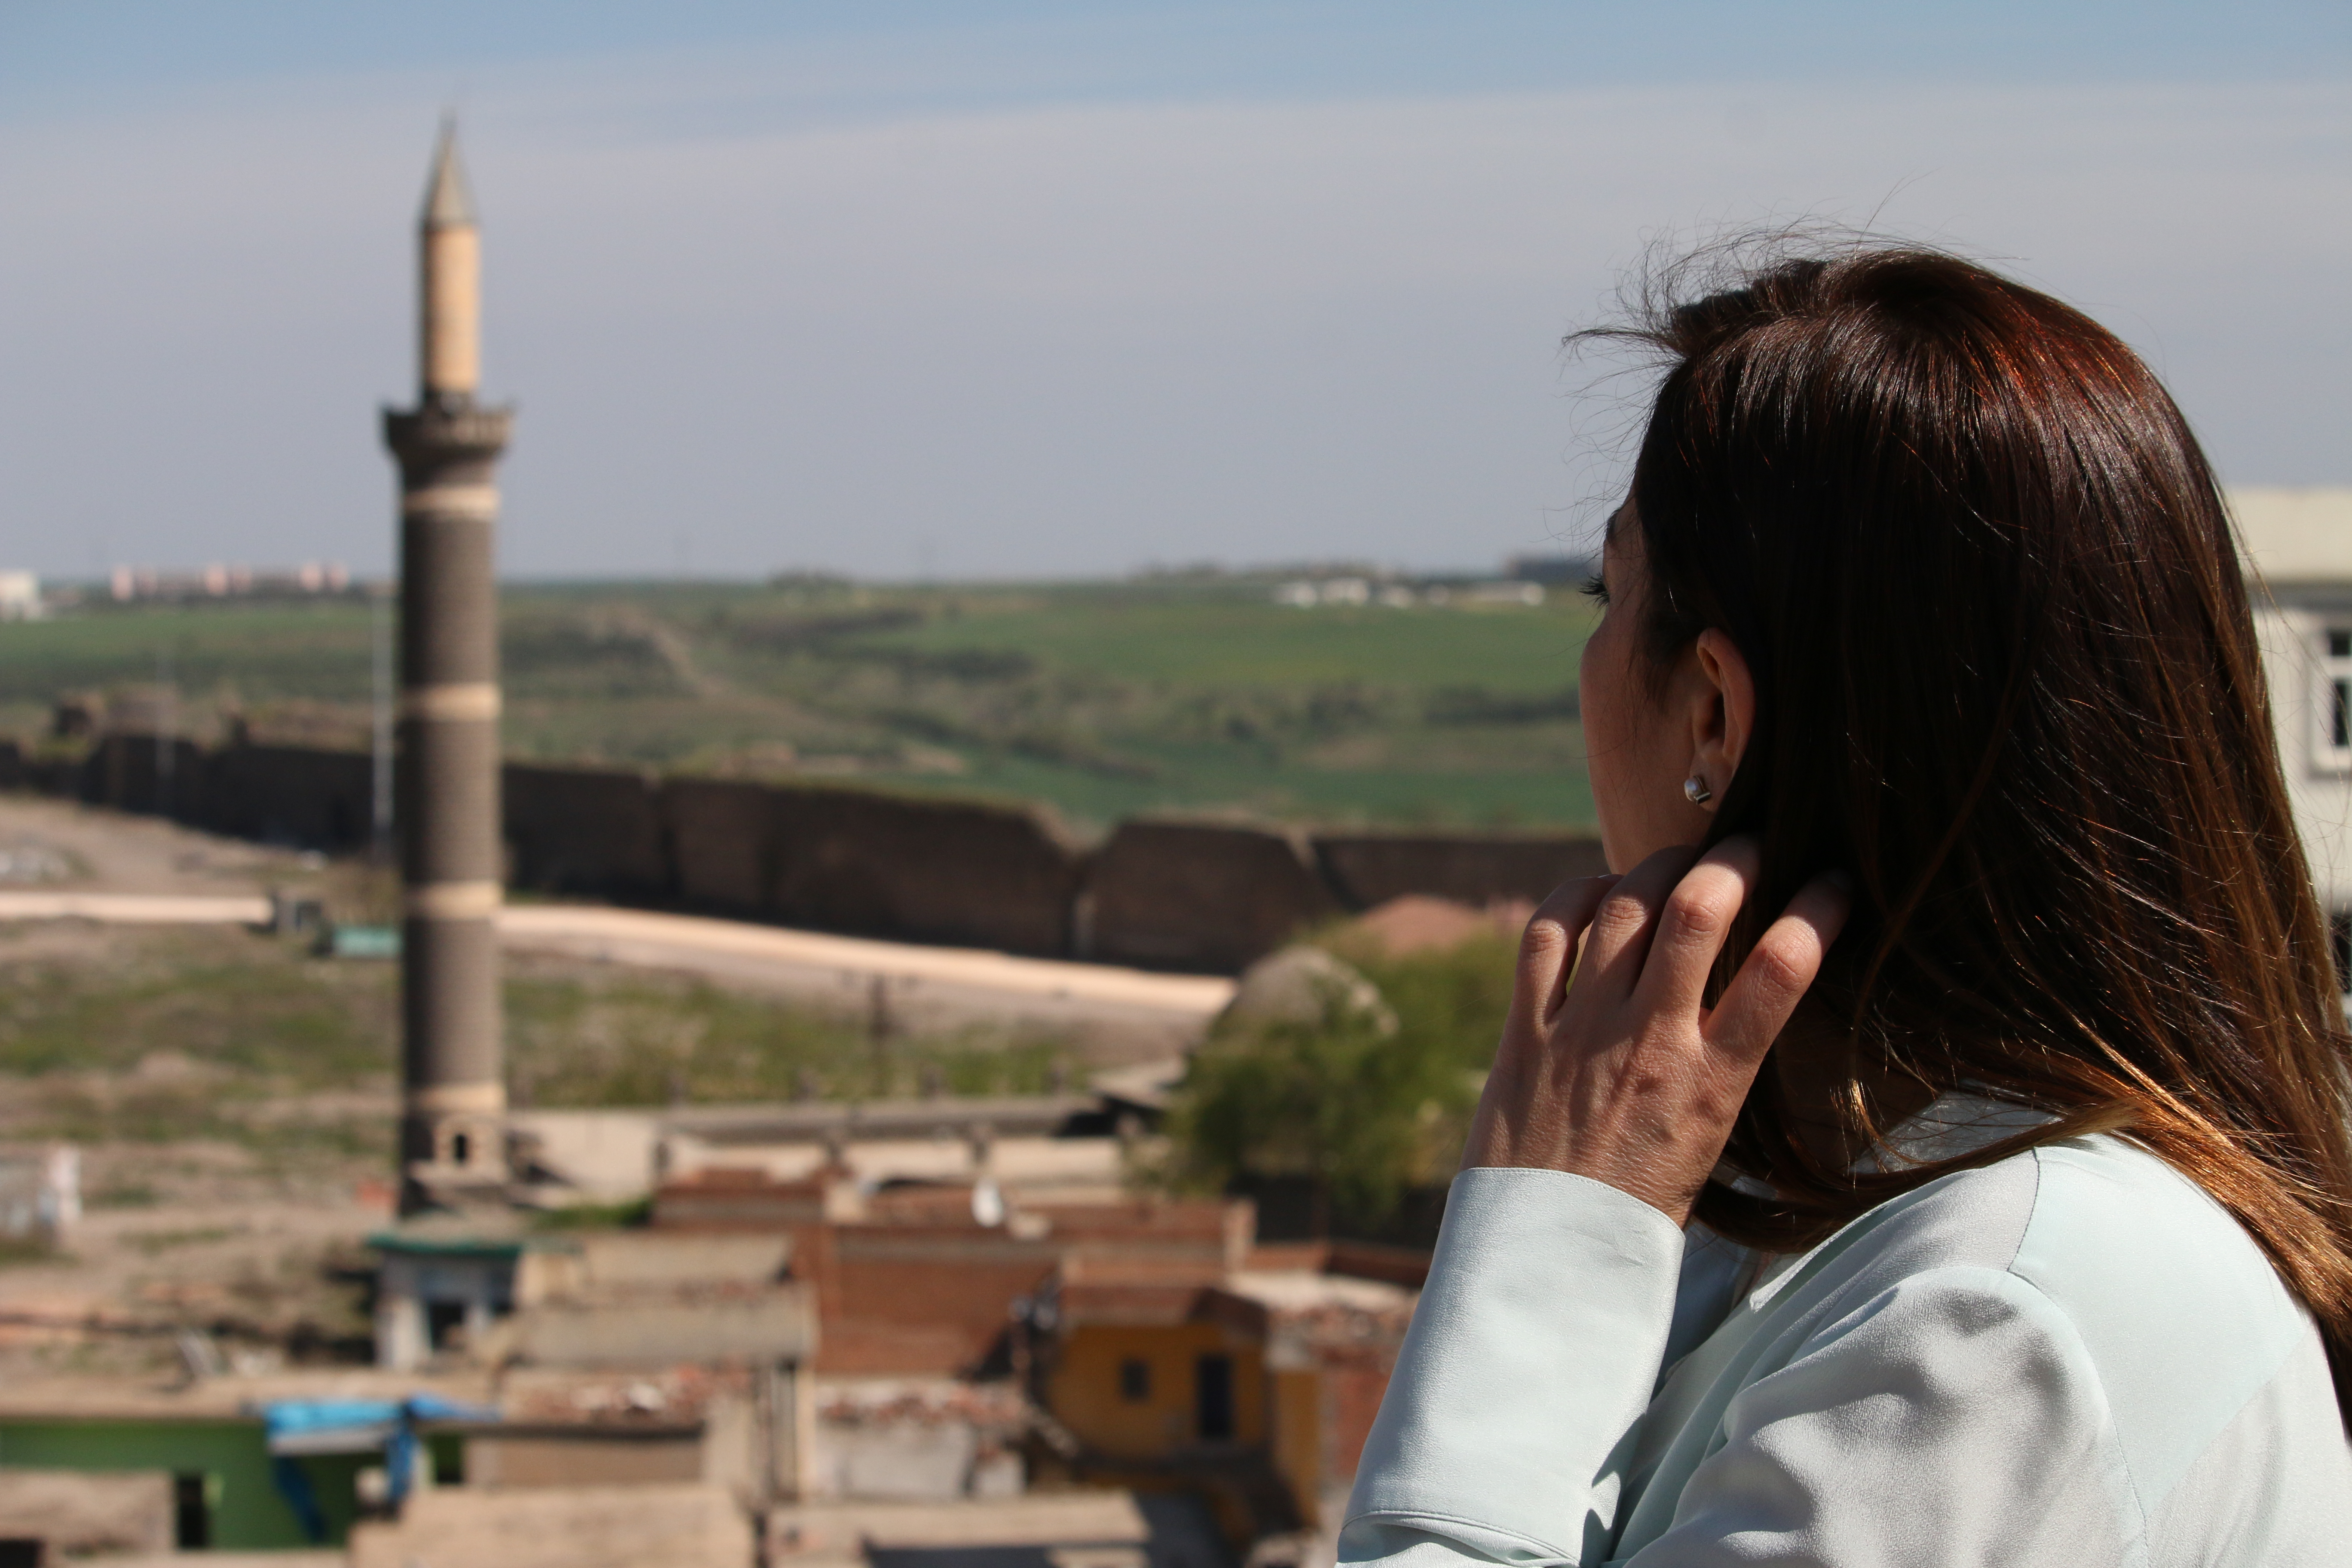 Nurcan Baysal in Diyarbakir